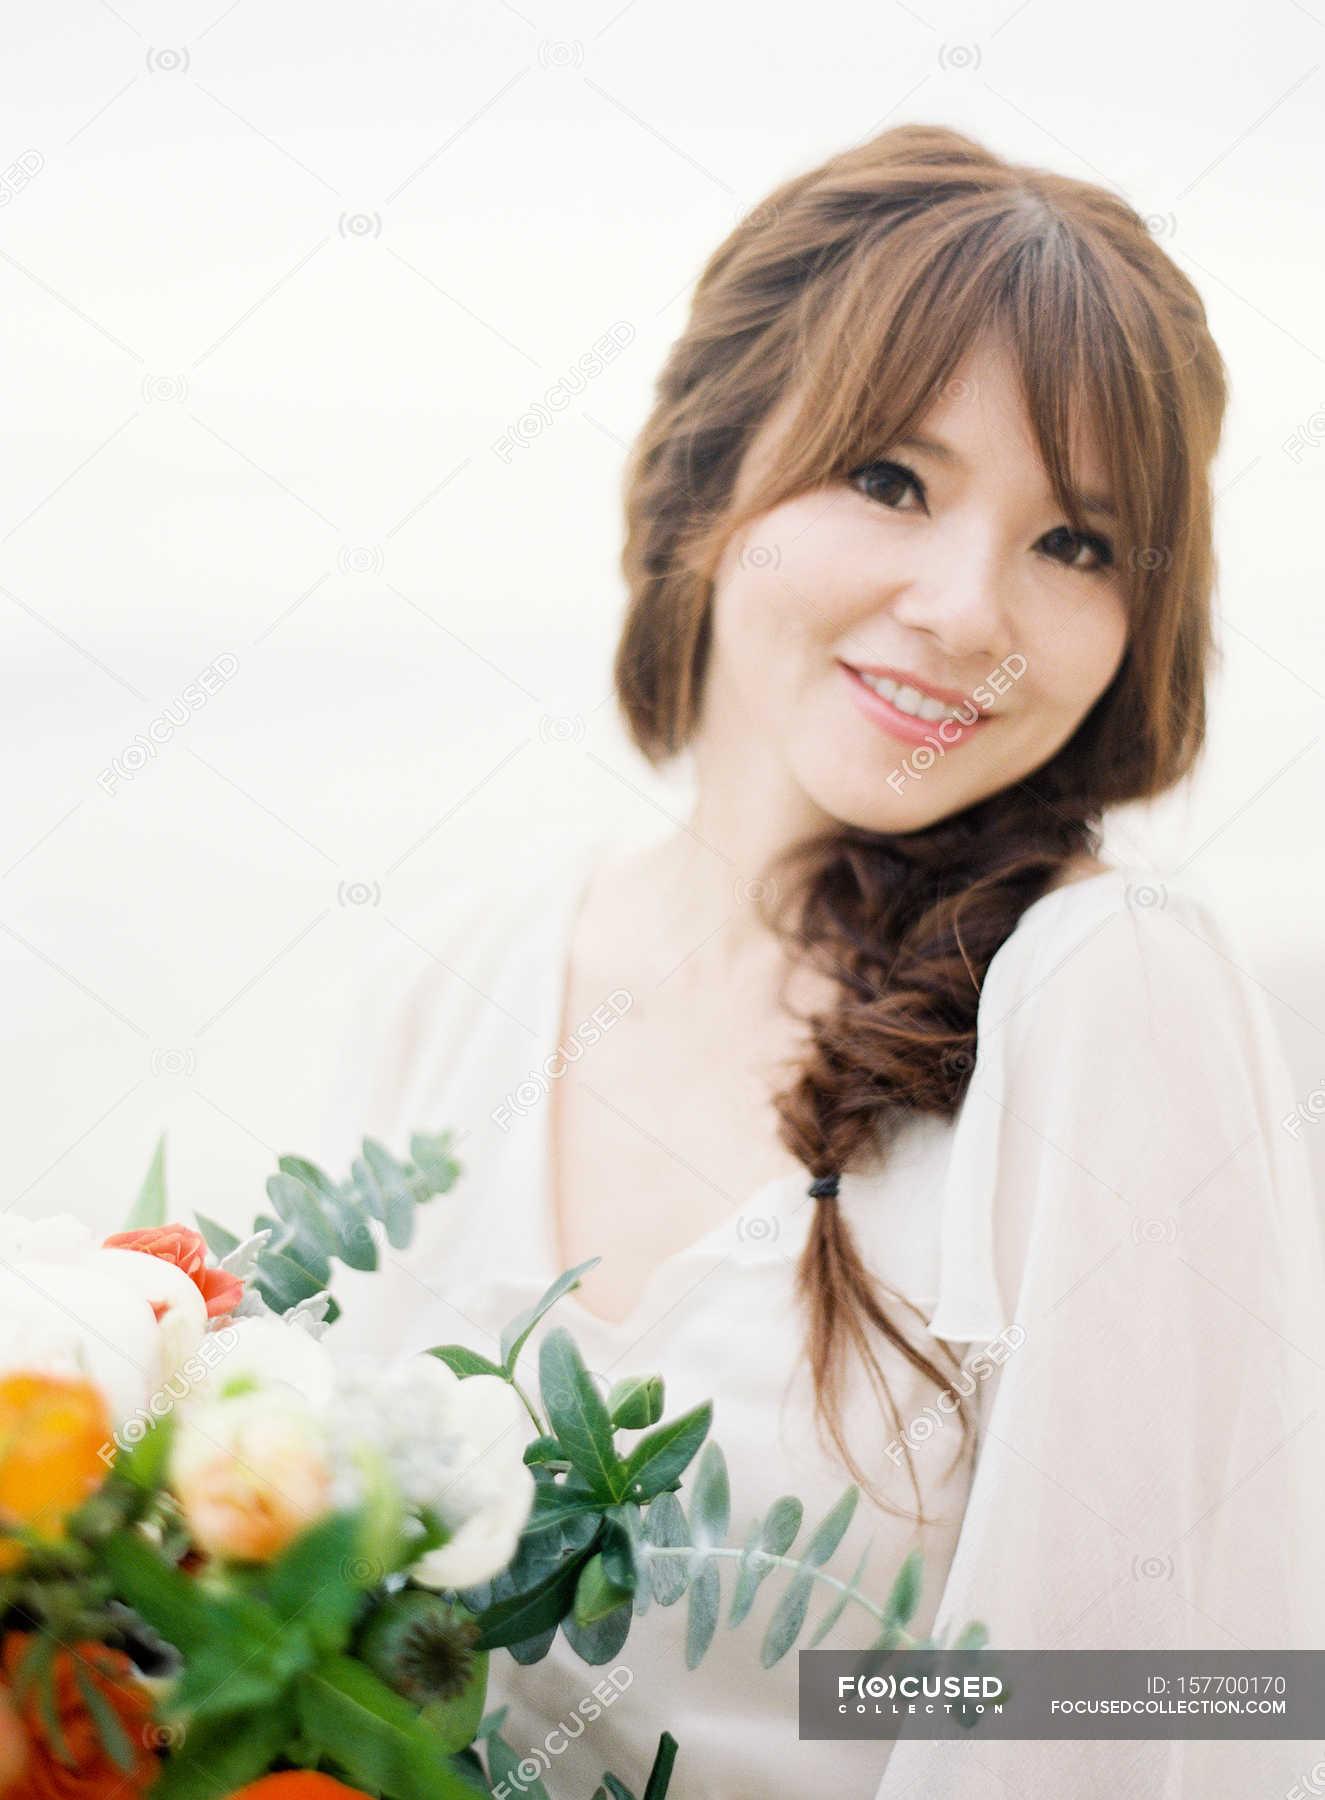 Beautiful young woman with flowers stock photo 157700170 izmirmasajfo